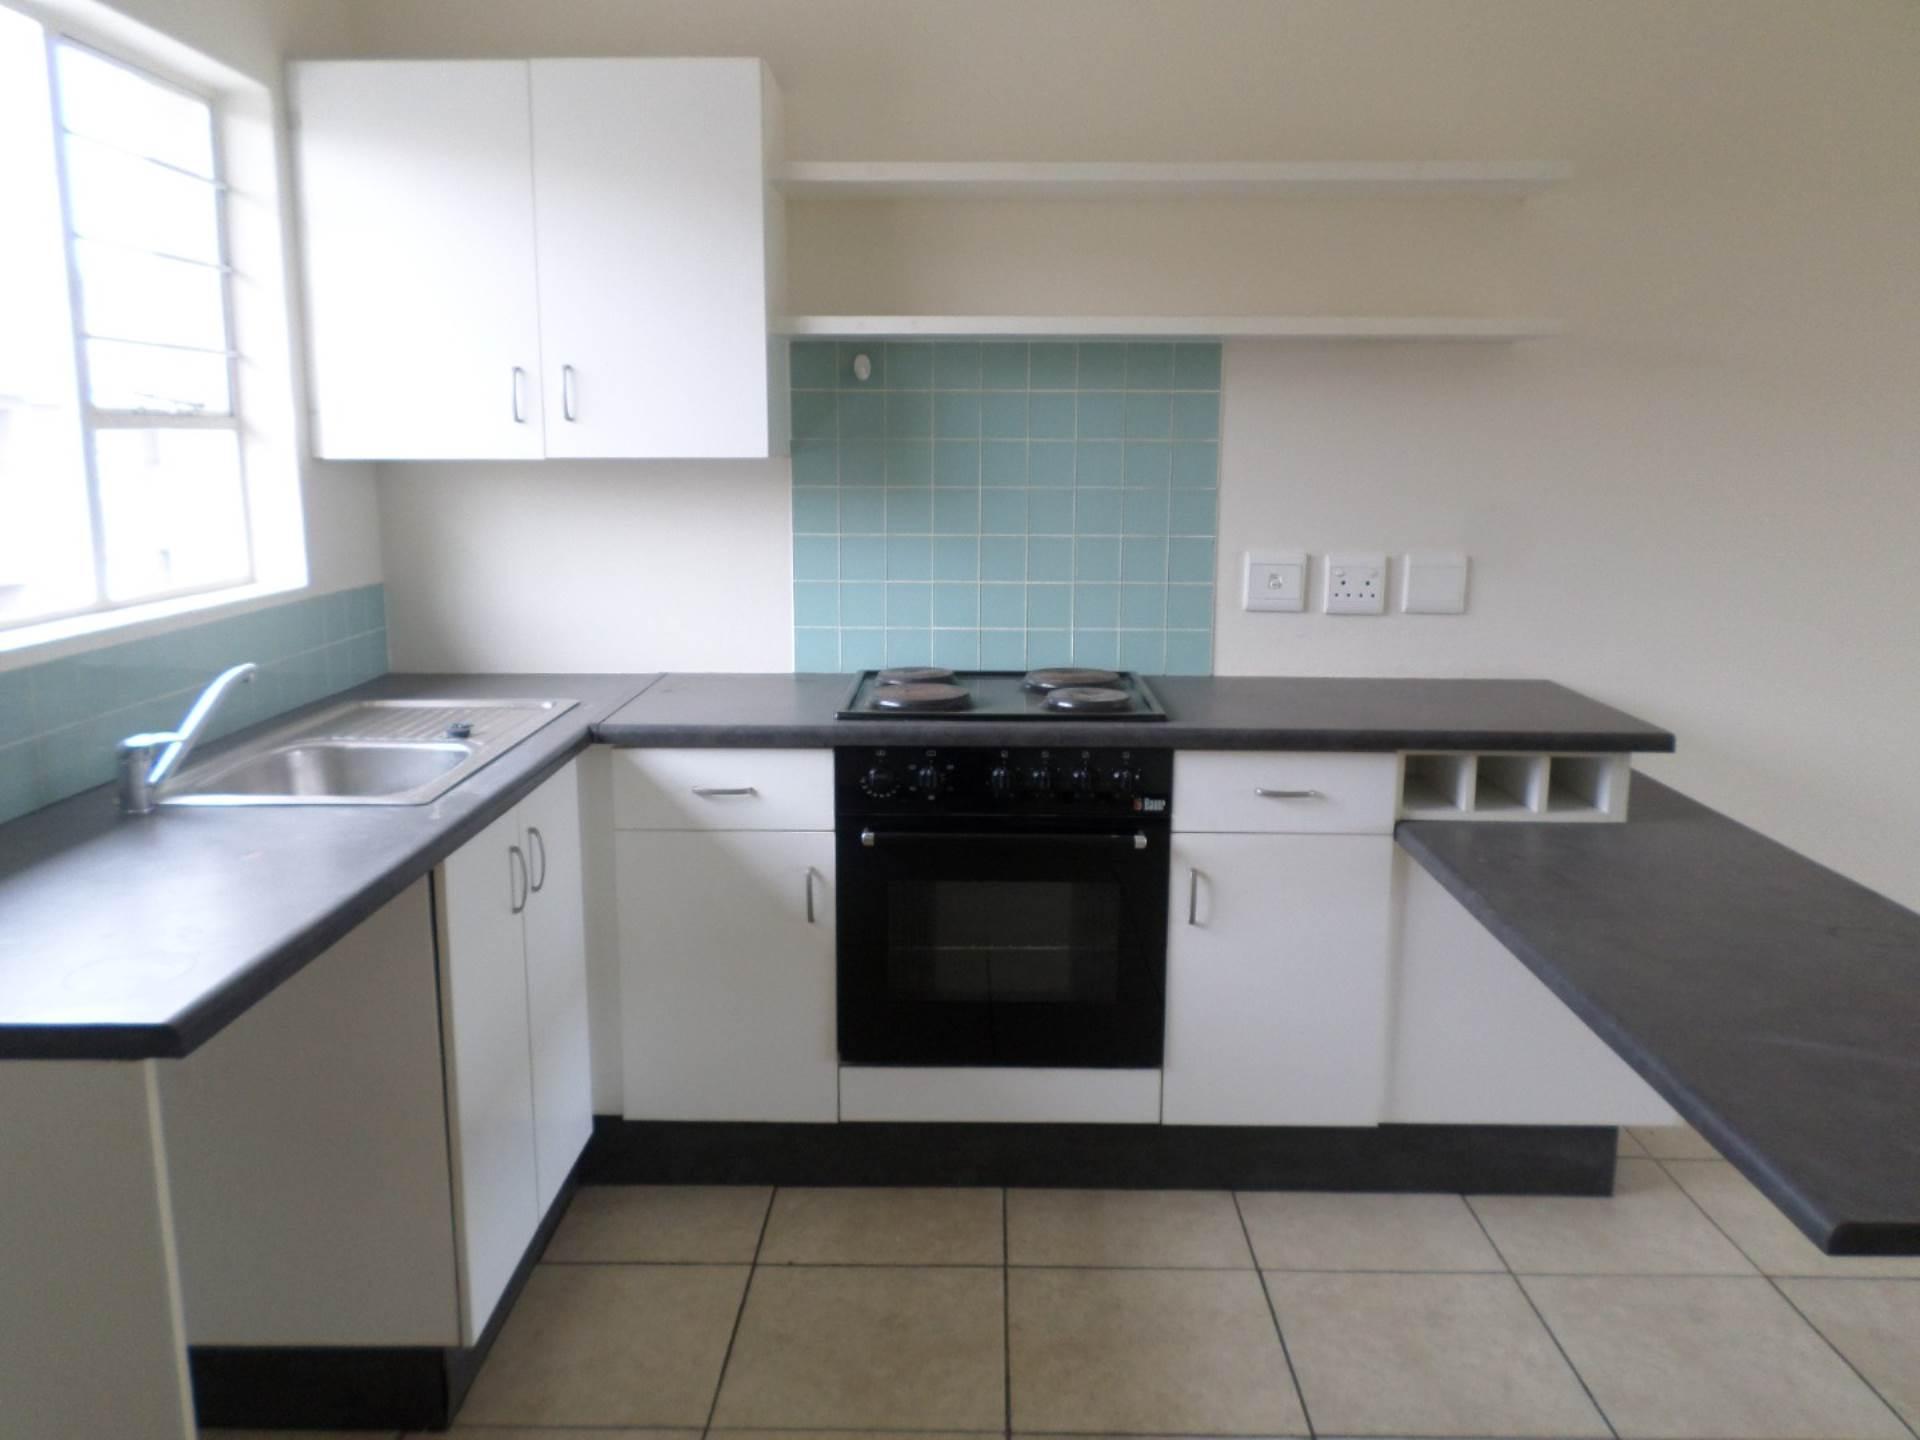 2 BedroomTownhouse For Sale In Brenthurst